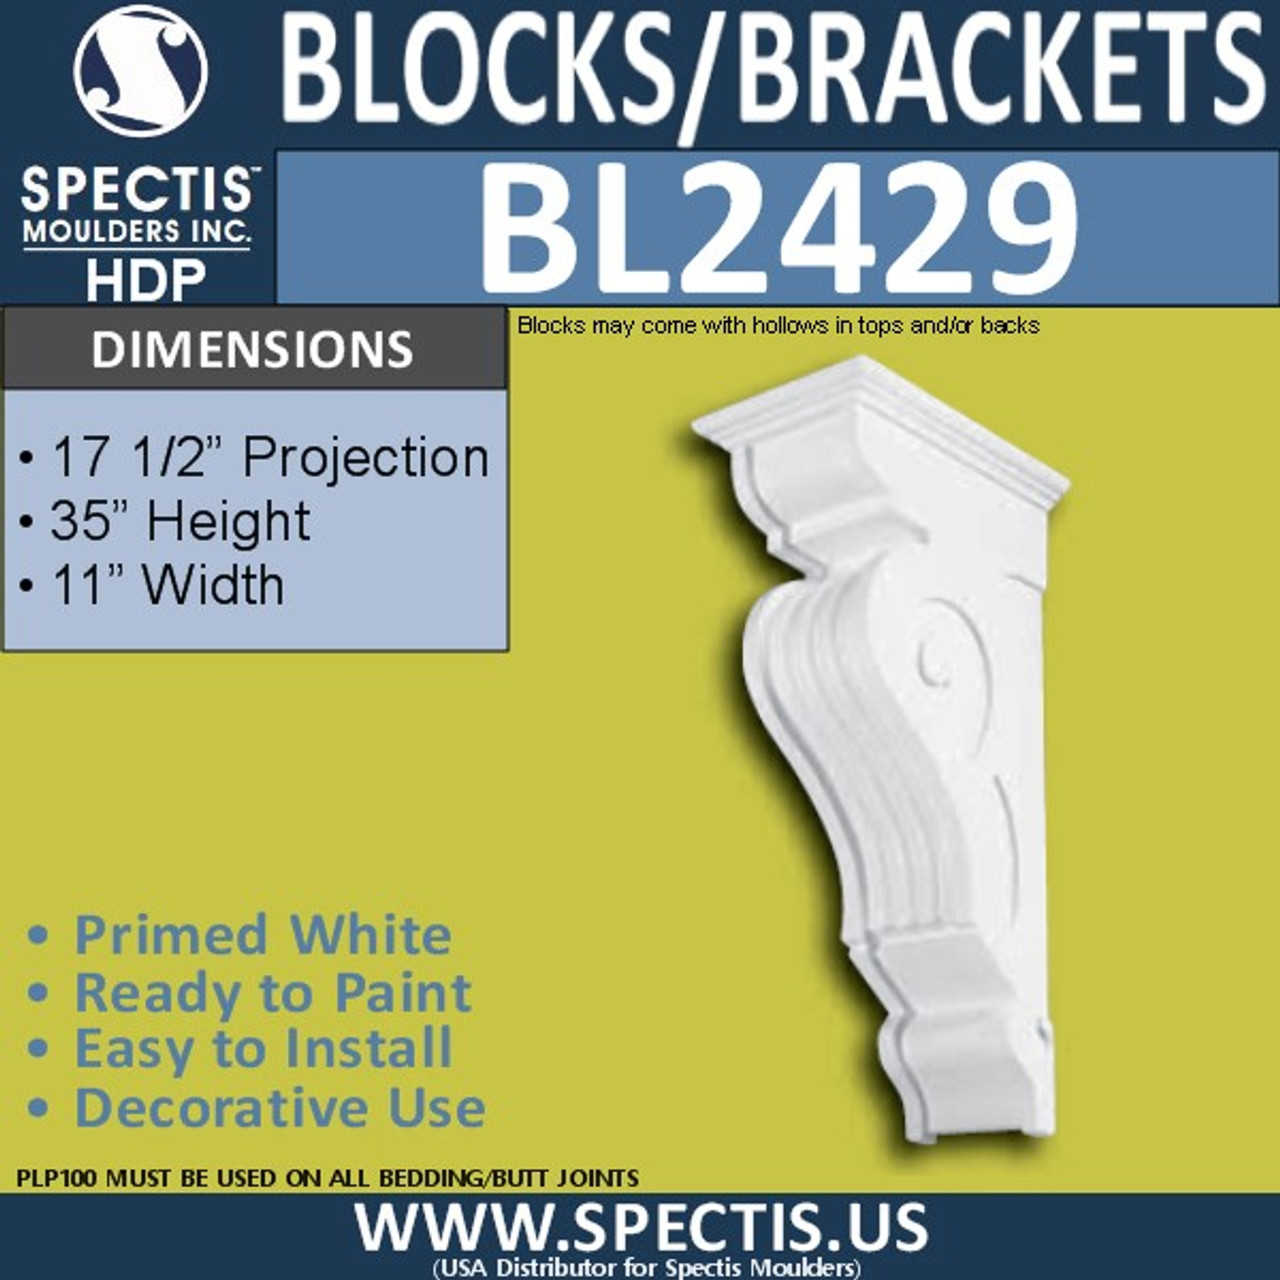 "BL2429 Eave Block or Bracket 11""W x 35""H x 17.5"" P"